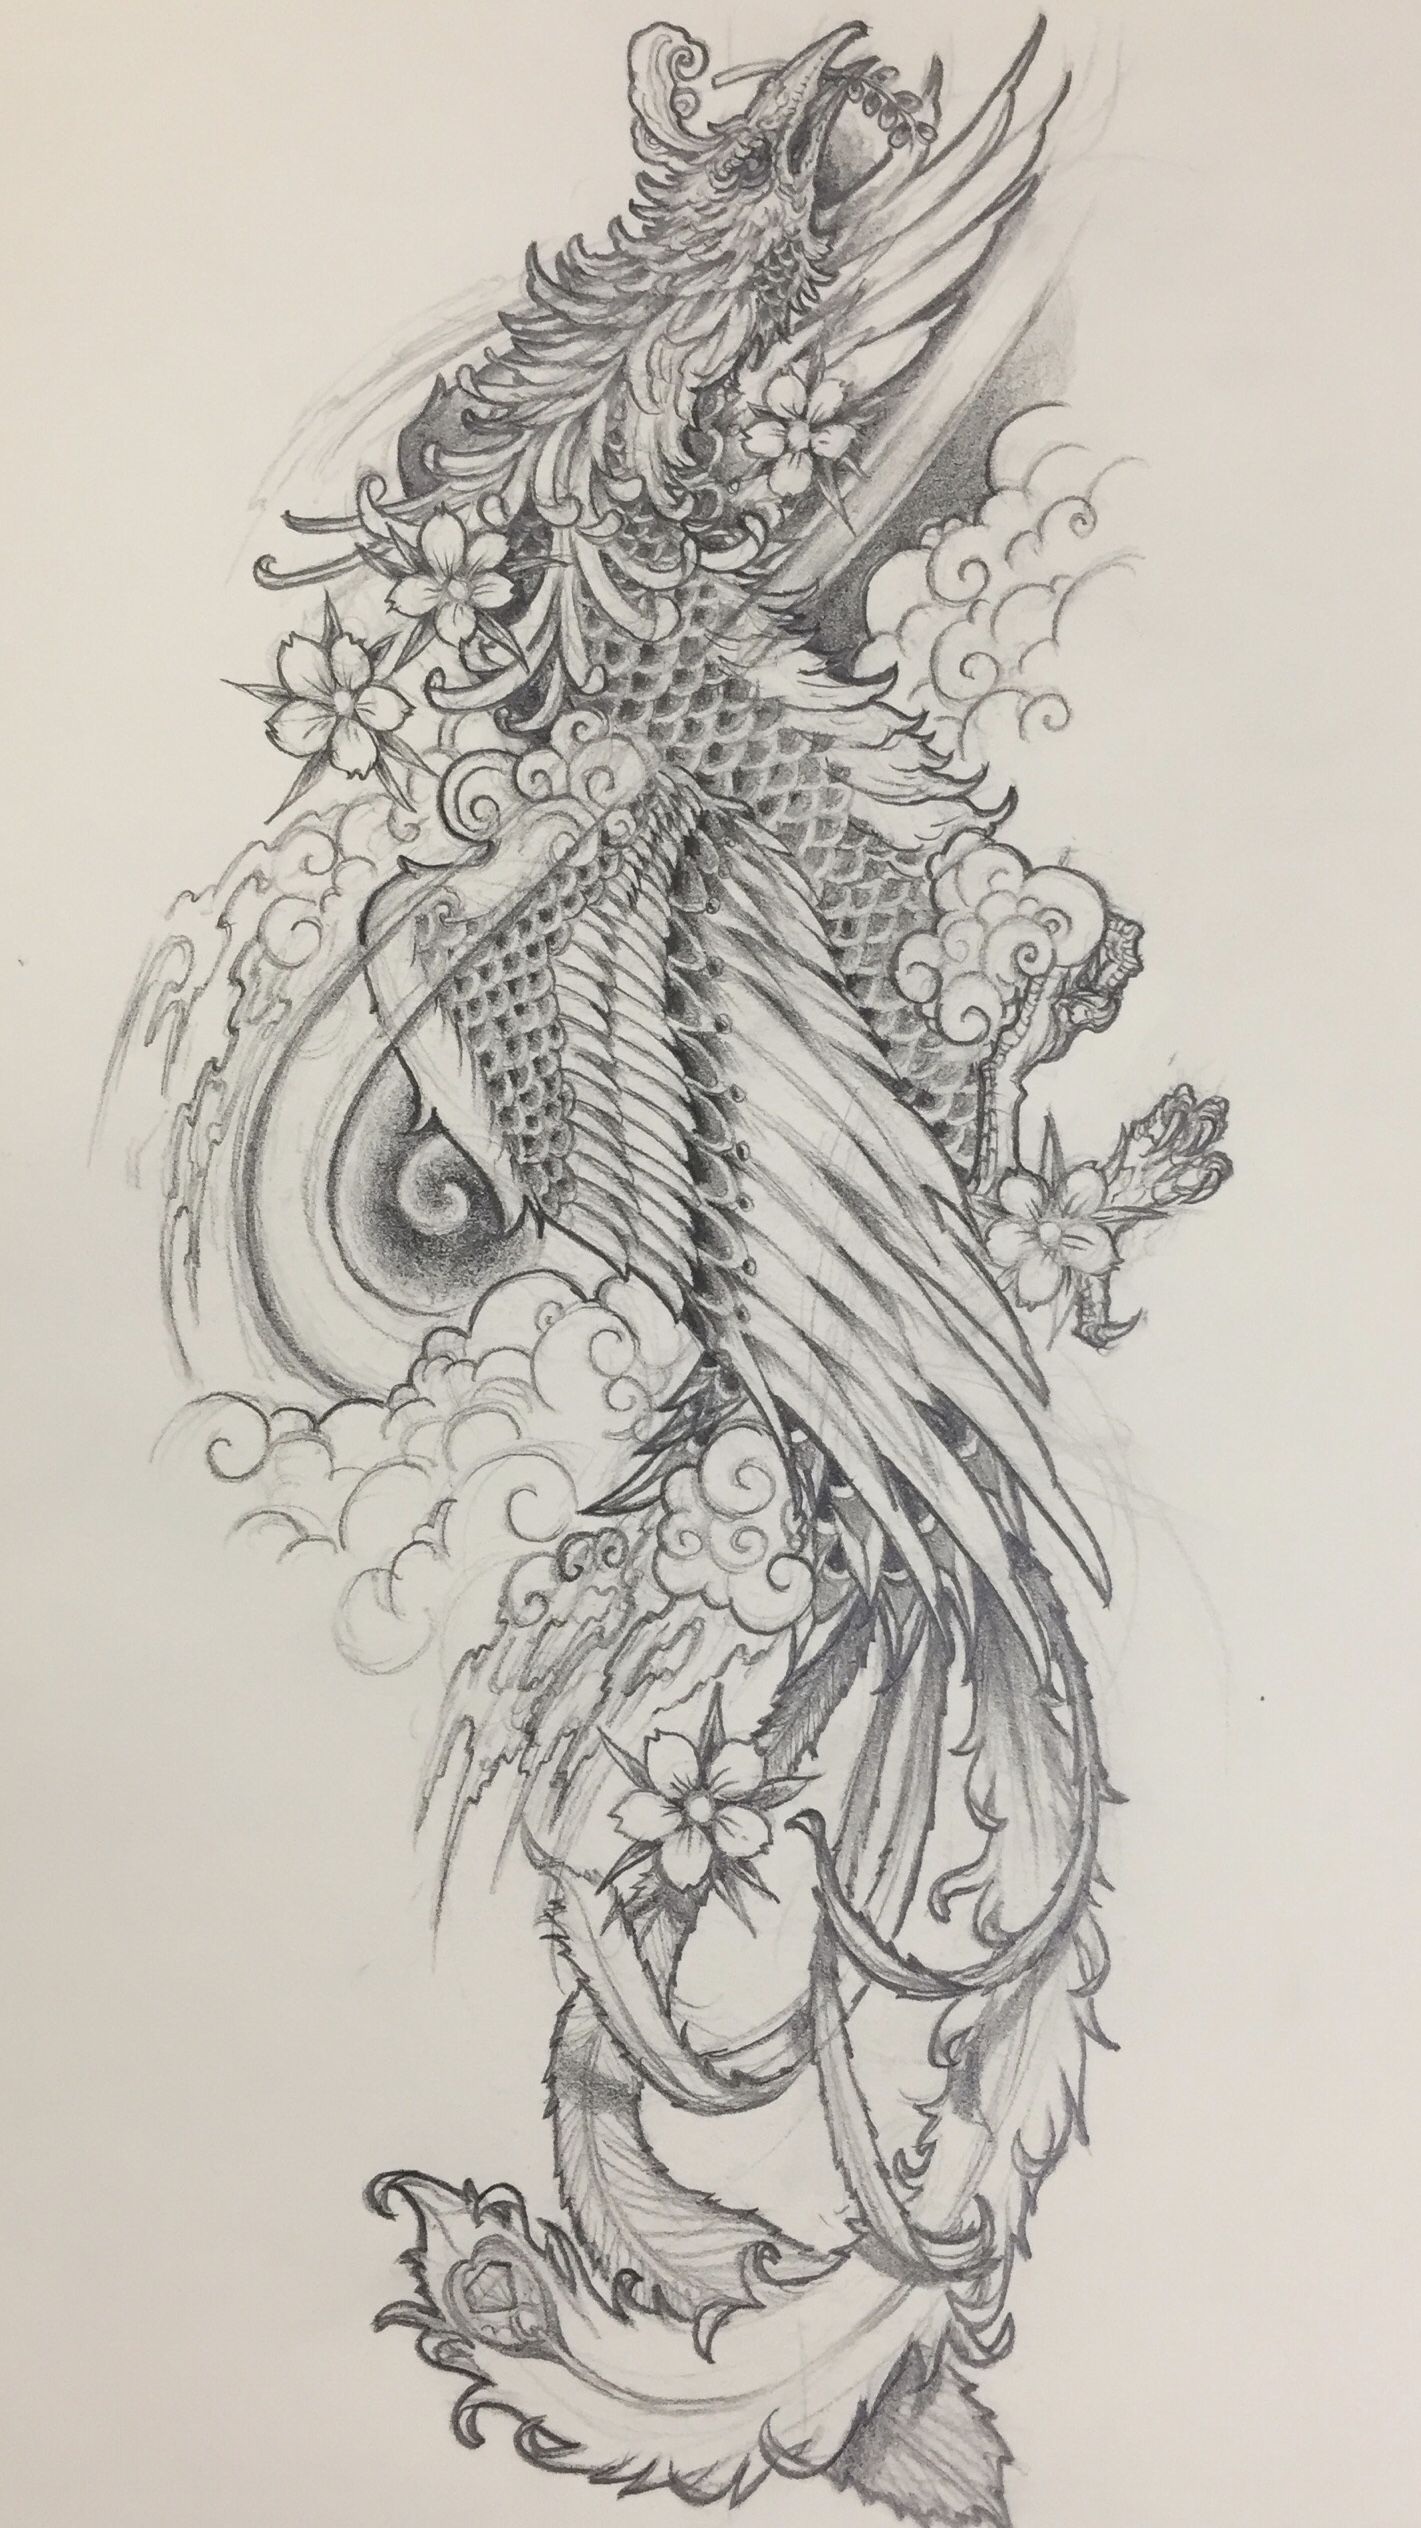 Japanese Phoenix Tattoo Design From Kingston Chan Concept Ink Visit Http Instagram Com Kingstonart For More Y Tưởng Hinh Xăm Hinh Xăm Nhật Hinh Xăm Mực